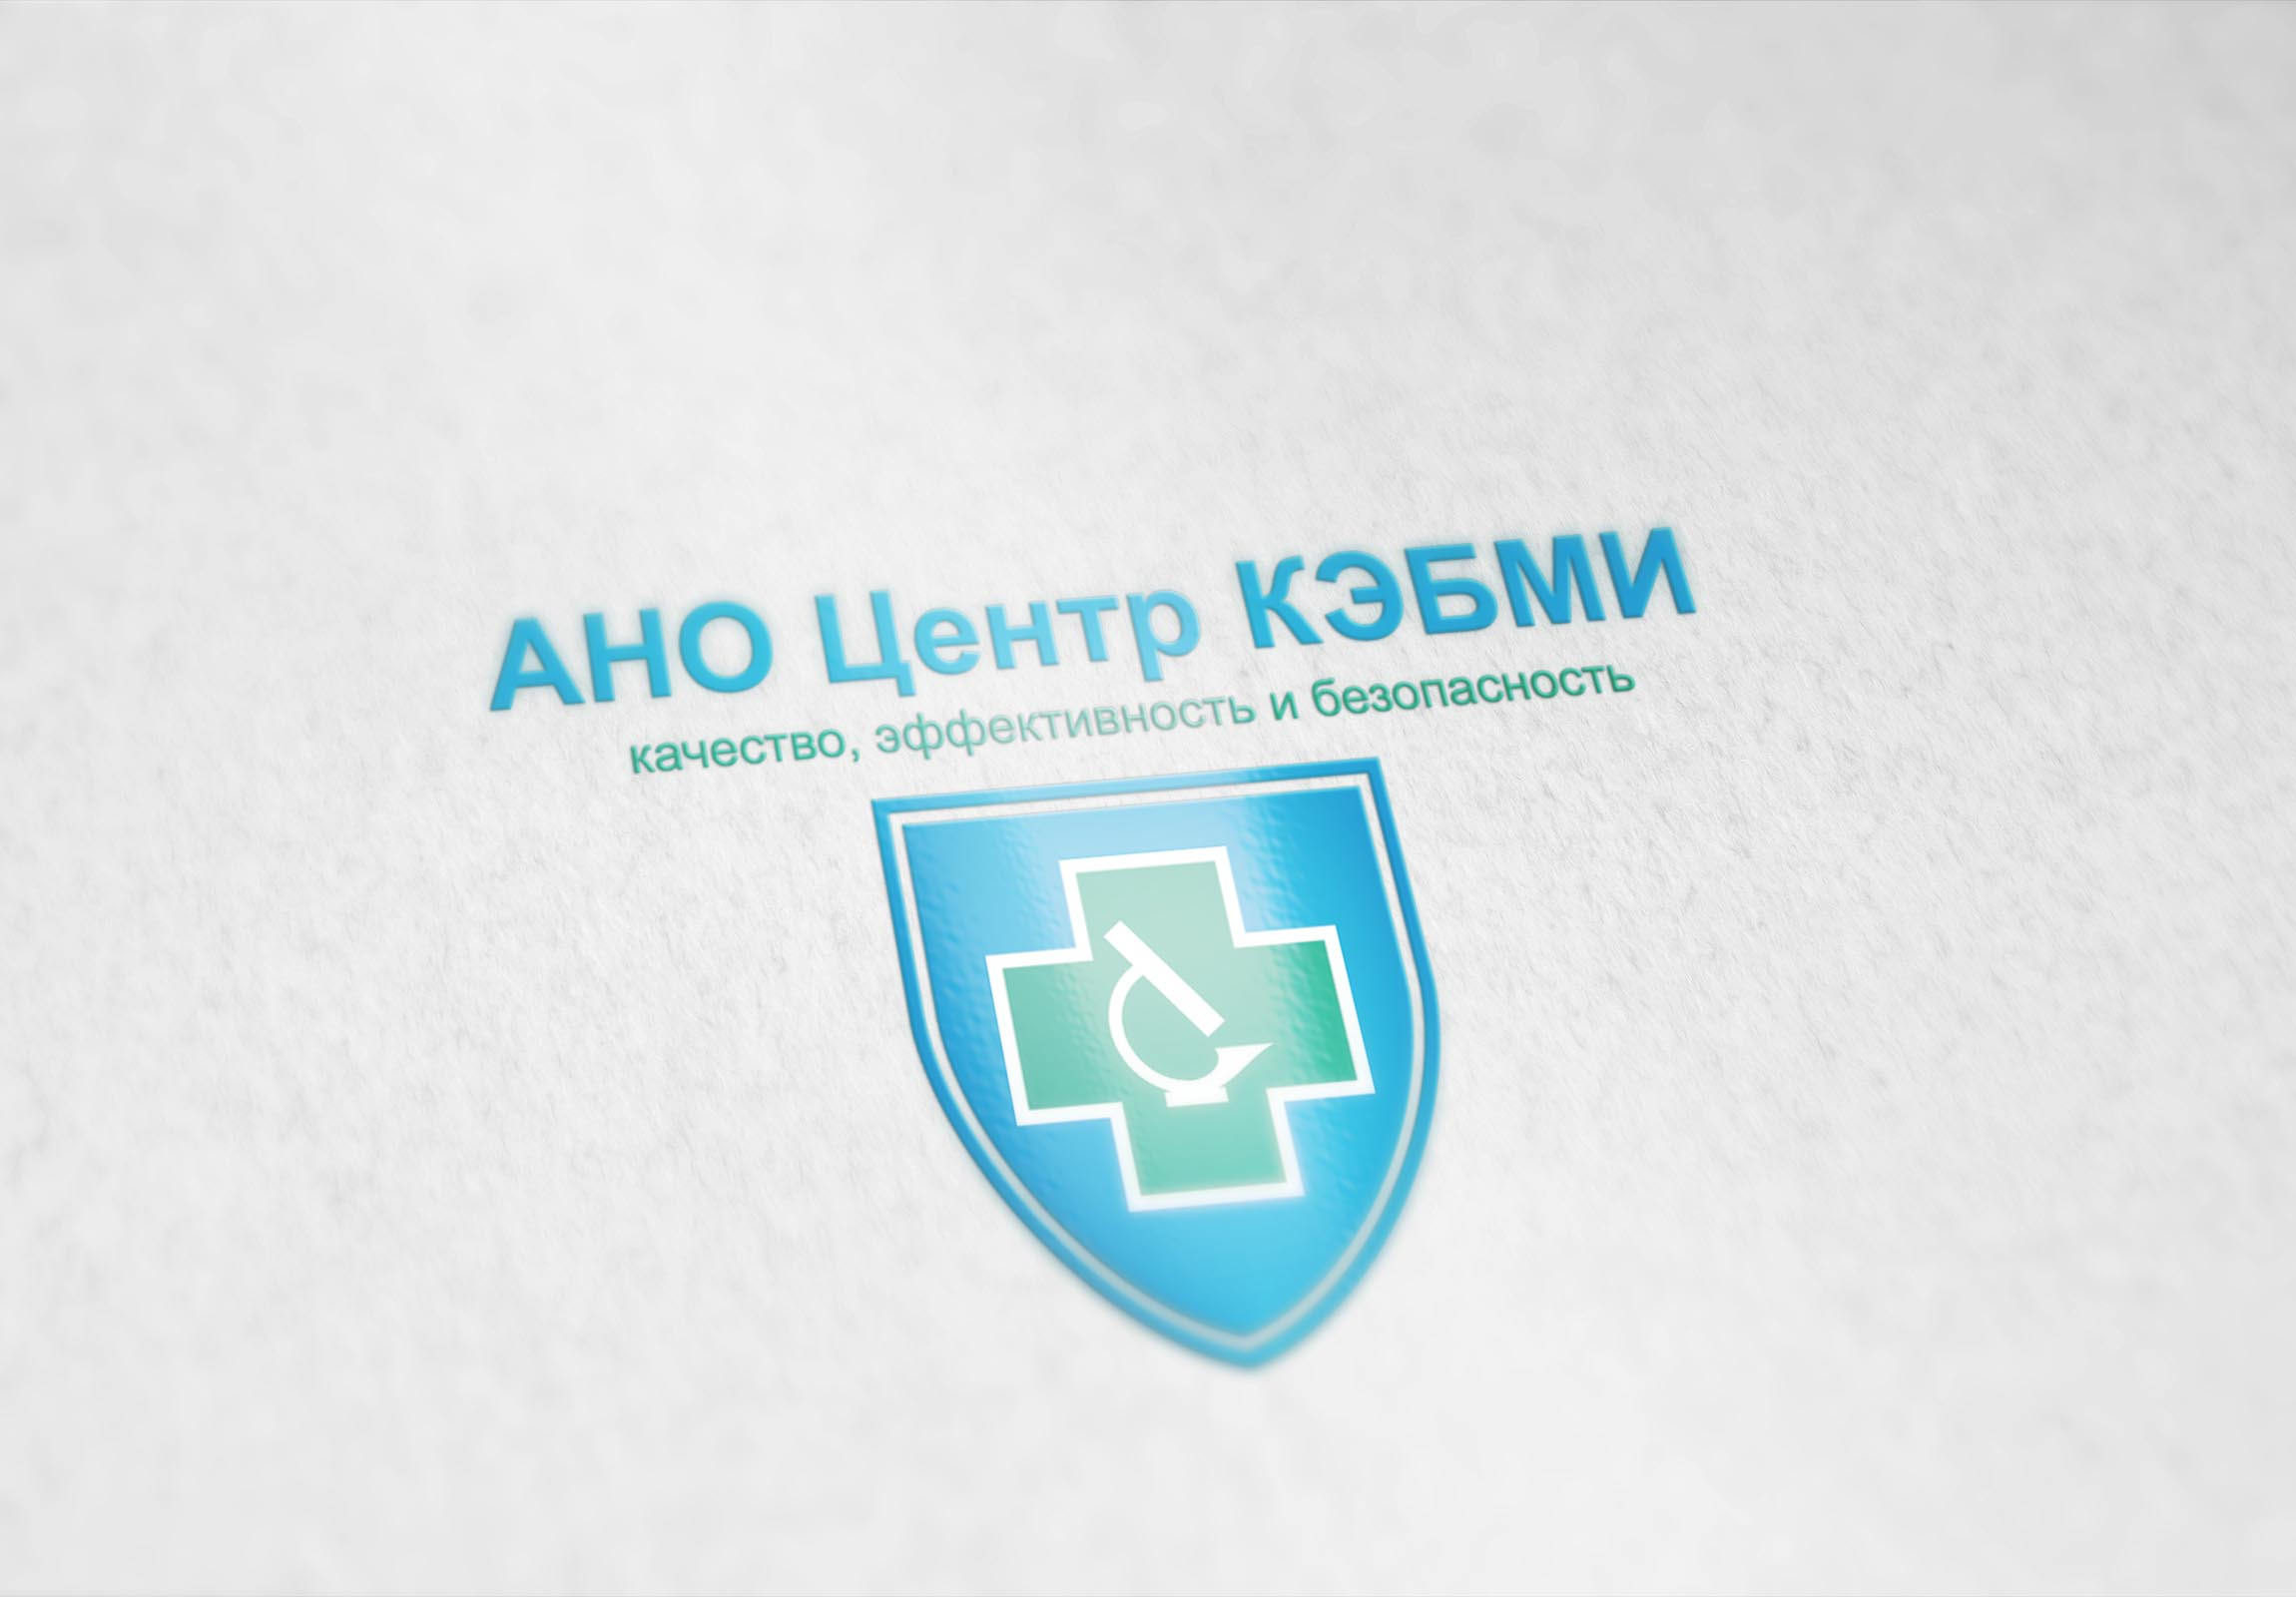 Редизайн логотипа АНО Центр КЭБМИ - BREVIS фото f_2705b1b792d6d390.jpg